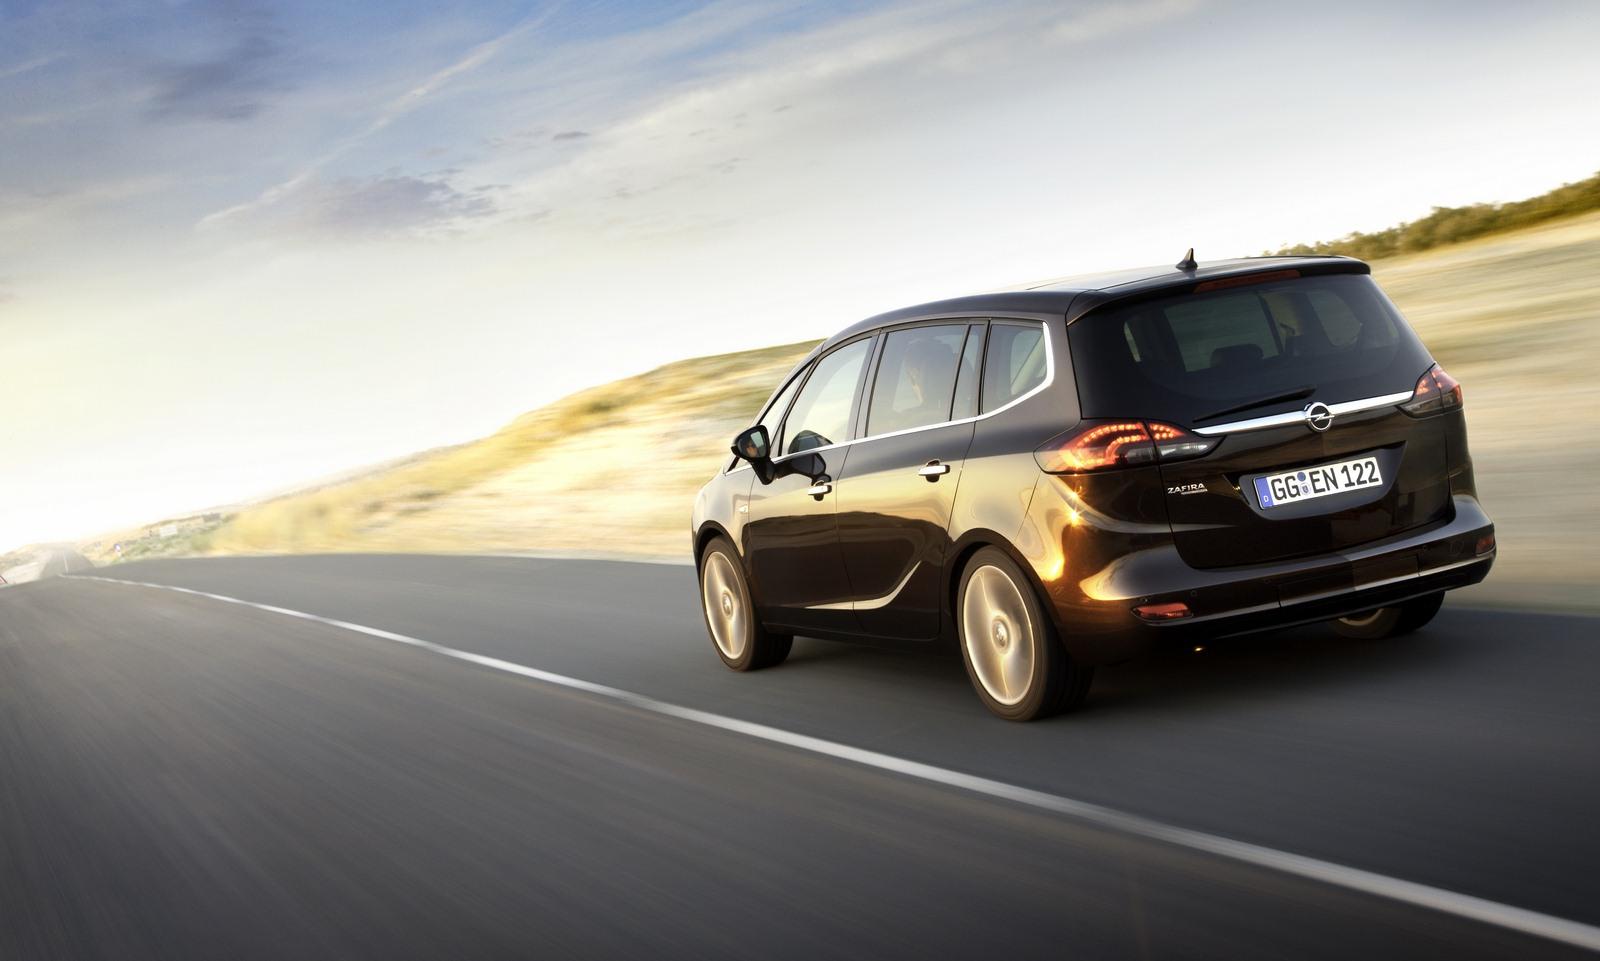 ?p?s?µ?: Opel Zafira Tourer 2012 ...